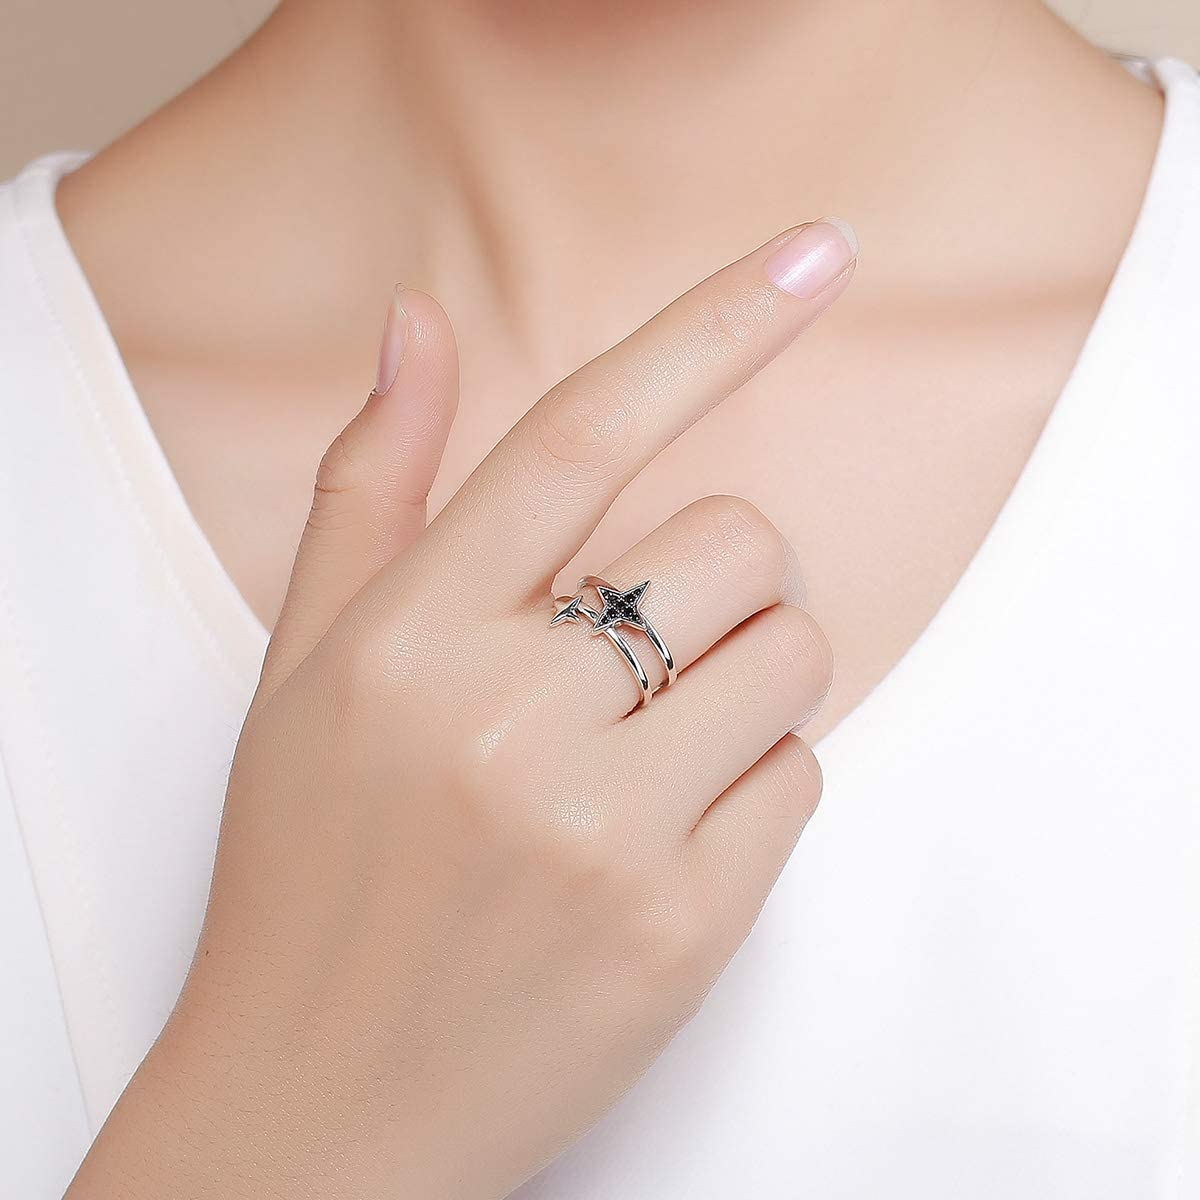 Black CZ The Kiss Sparkling Stars 925 Sterling Silver Adjustable Ring